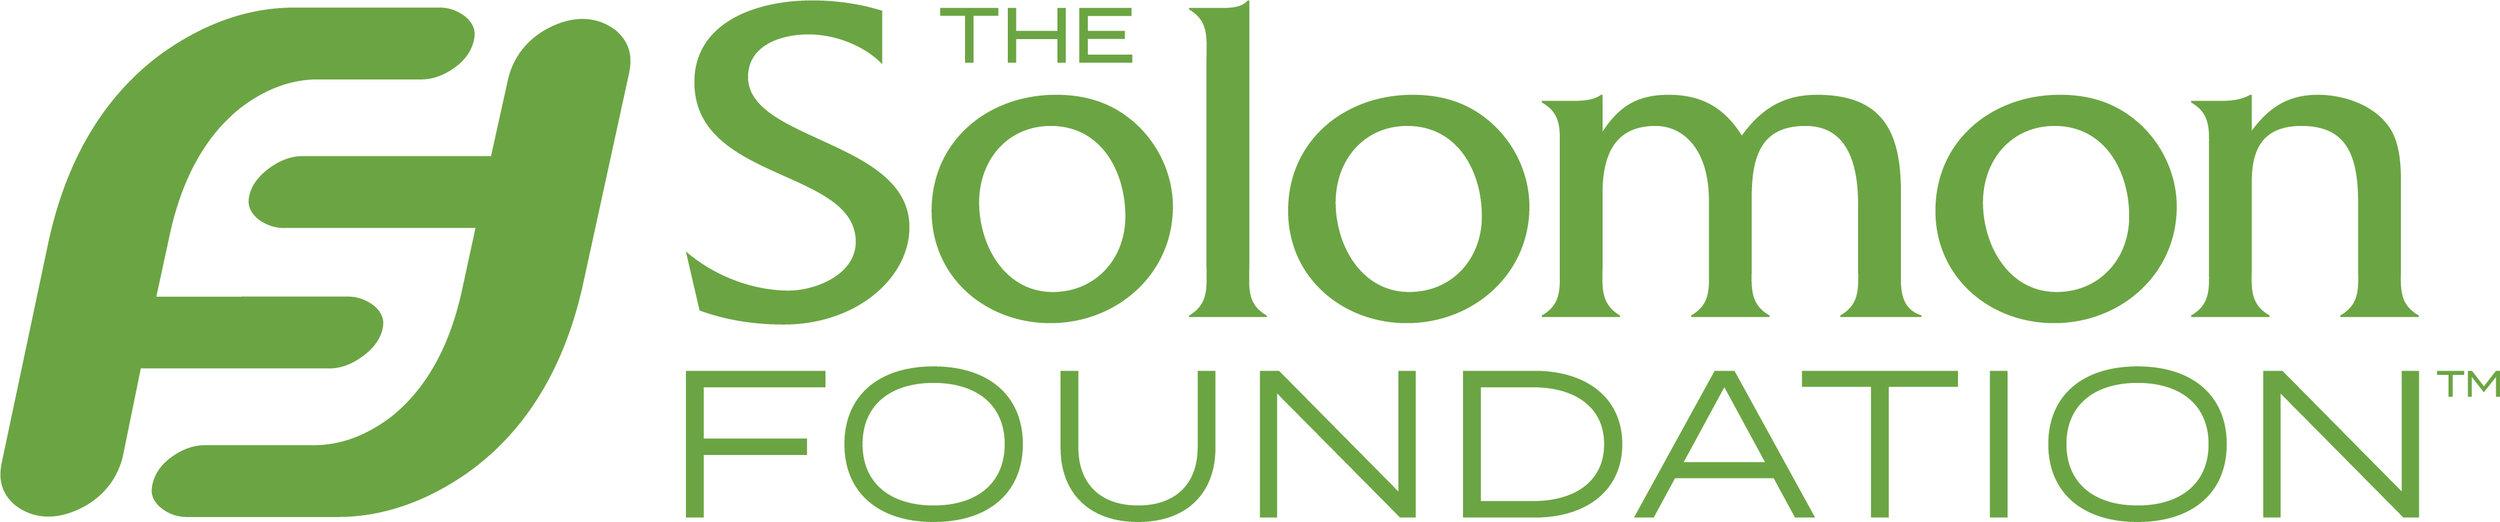 TheSolomonFoundation-Brandmark.jpg